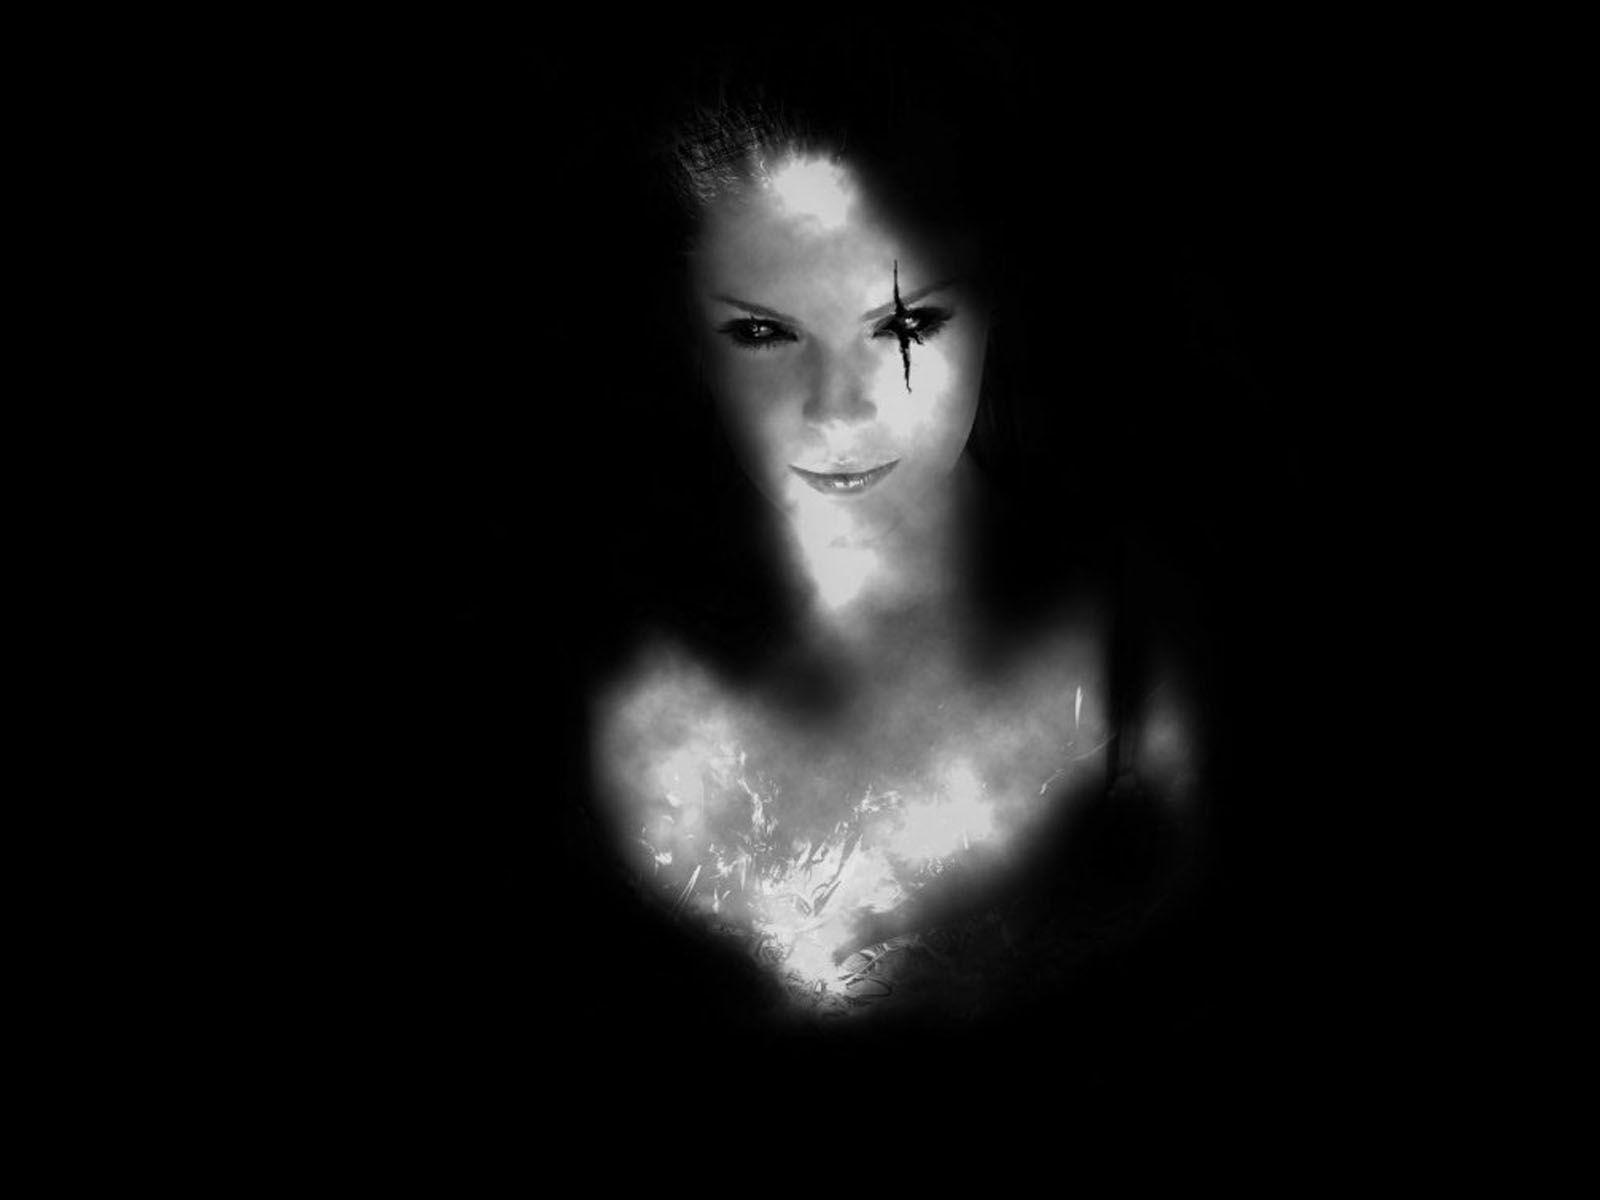 horror woman wallpapers - wallpaper cave